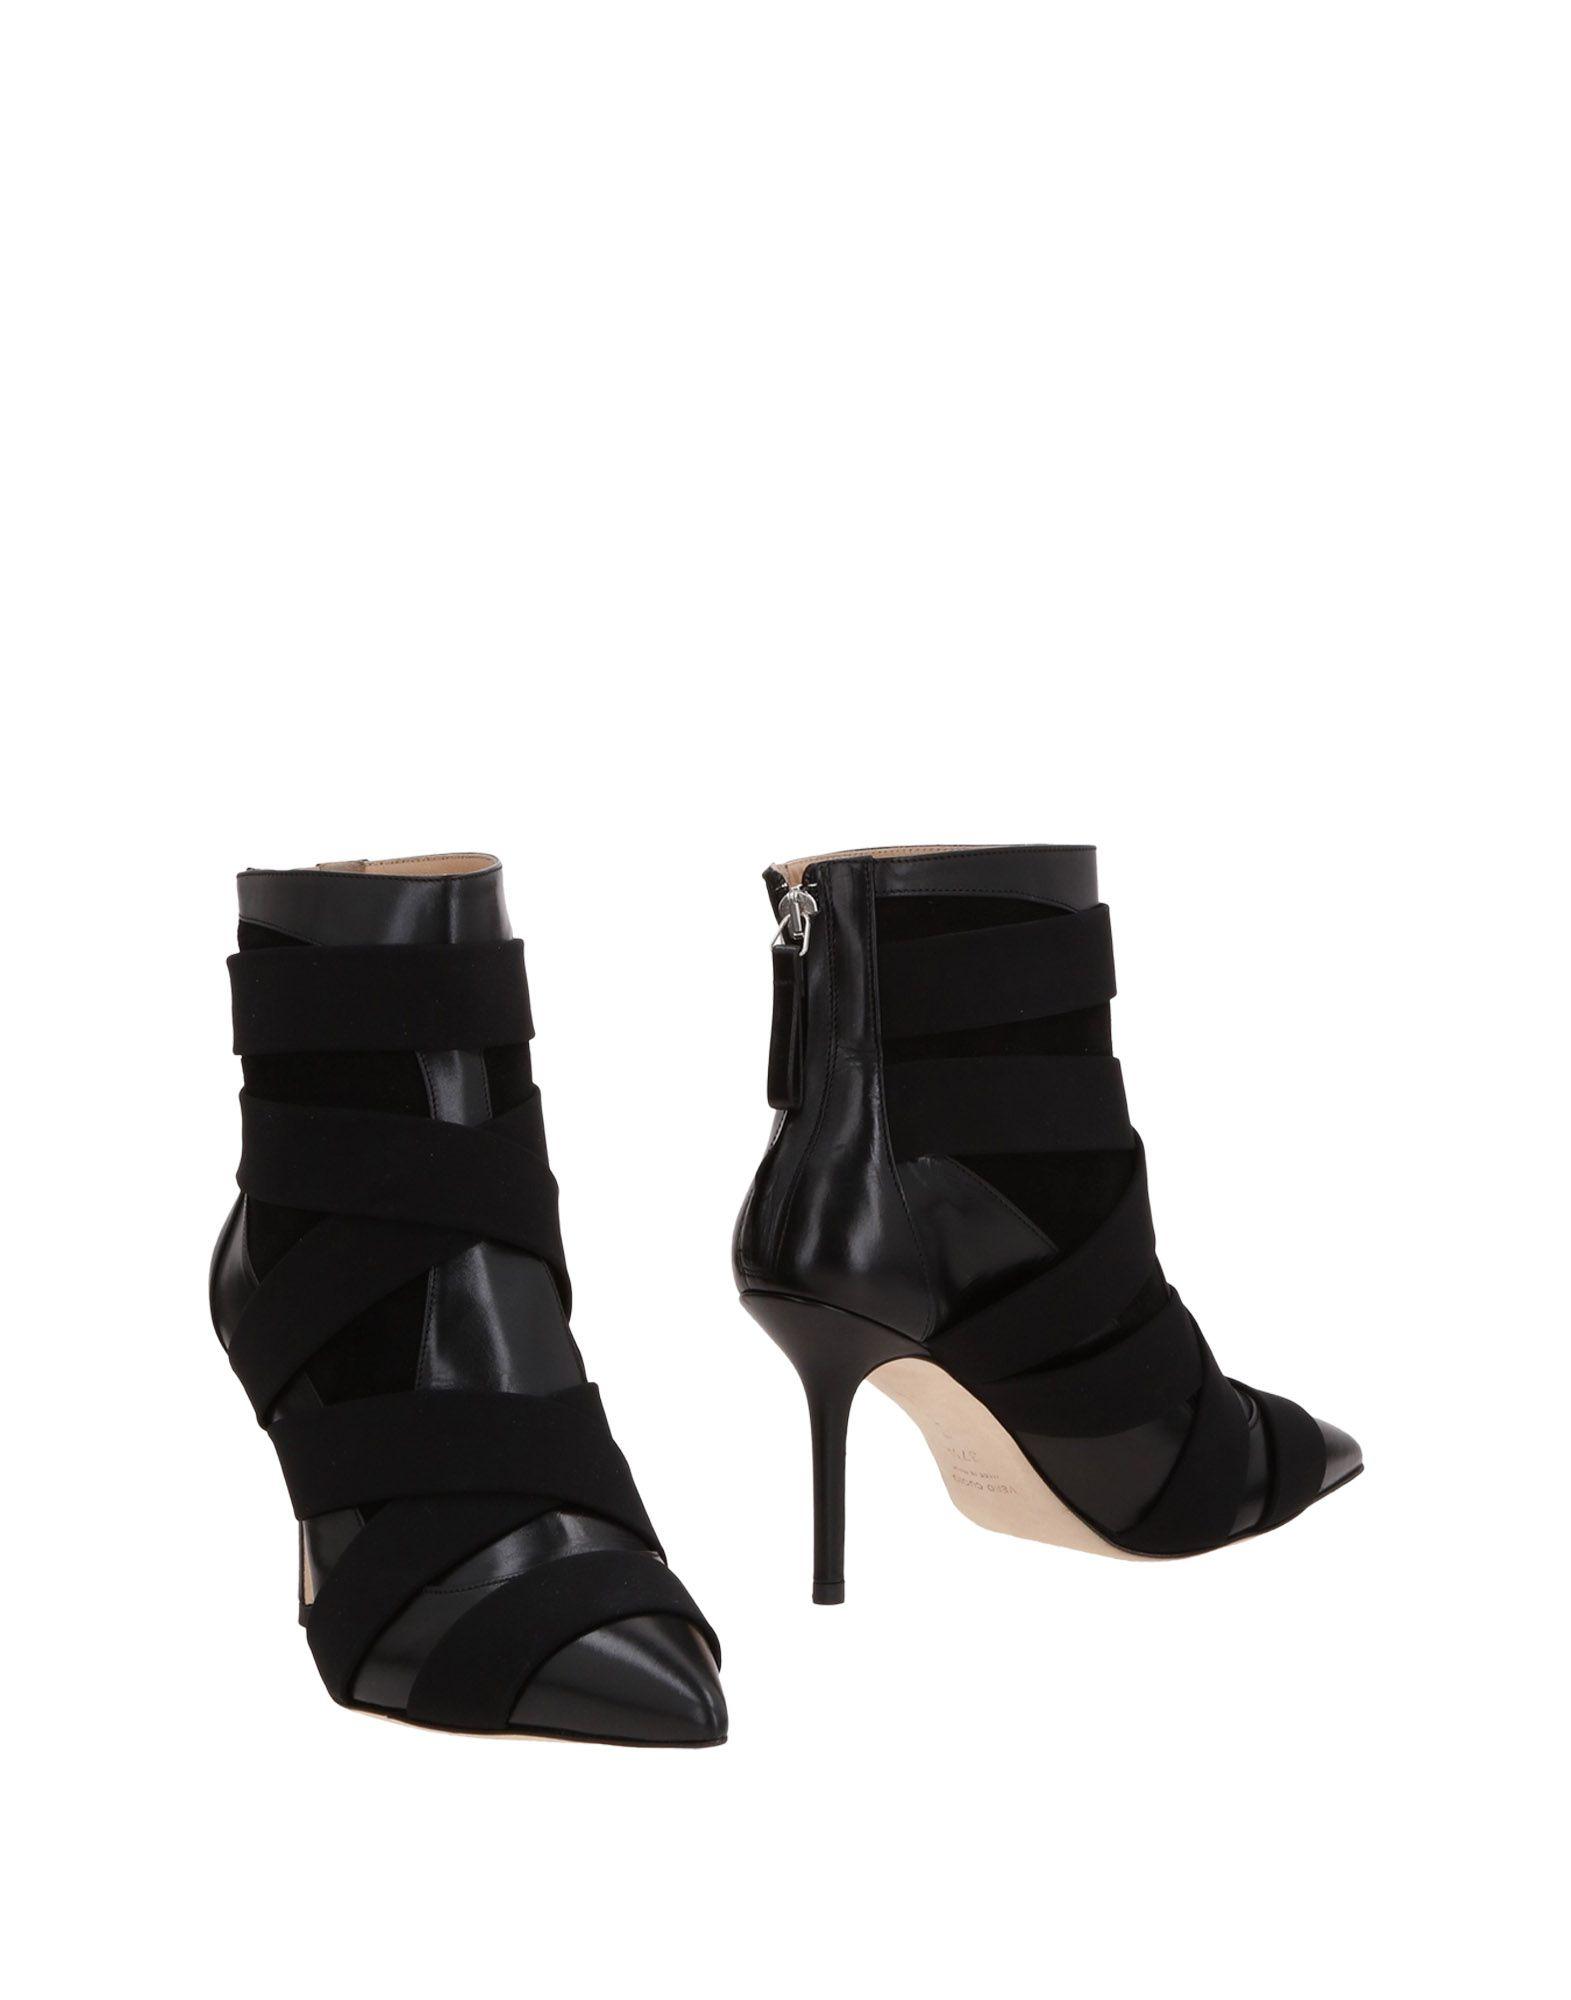 Benedetta Boroli Boroli Benedetta Ankle Boot - Women Benedetta Boroli Ankle Boots online on  Australia - 11463463LD 930576